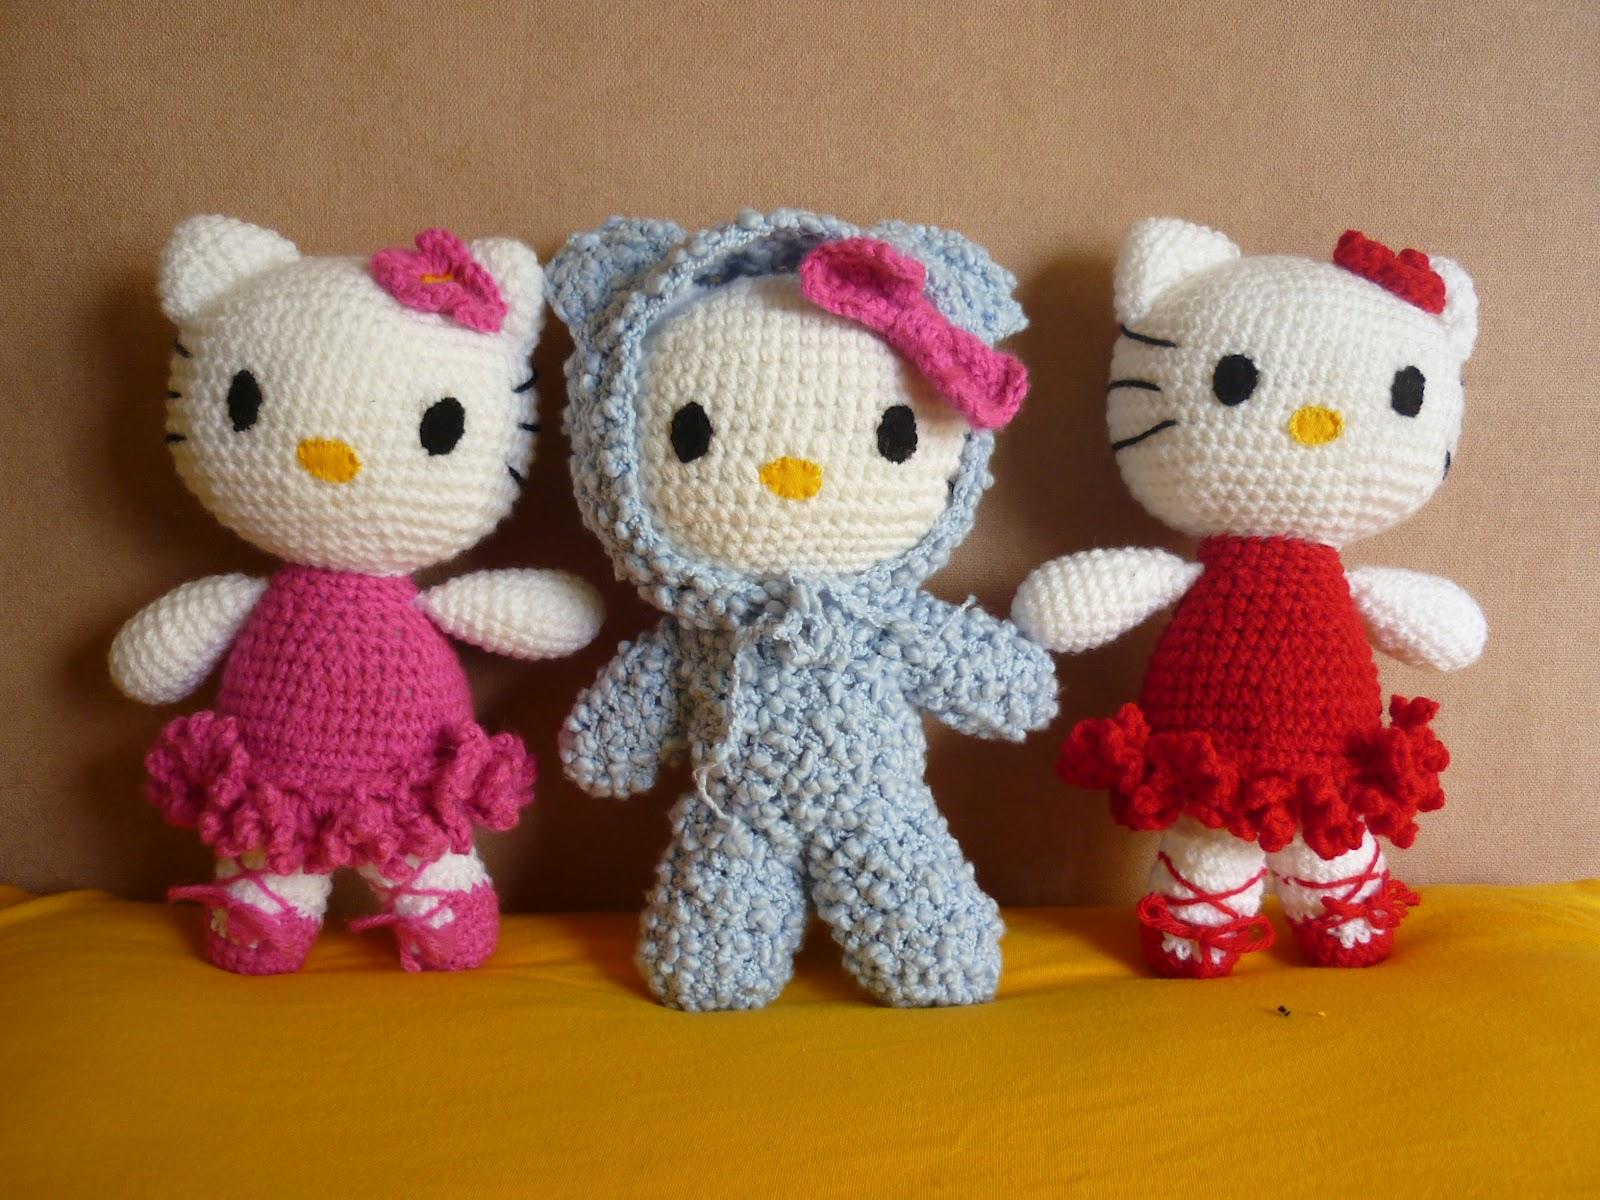 Free Crochet Pattern Heart Shaped Baby Doll : Tejiendo Suenos: Hello Kitty Amigurumi